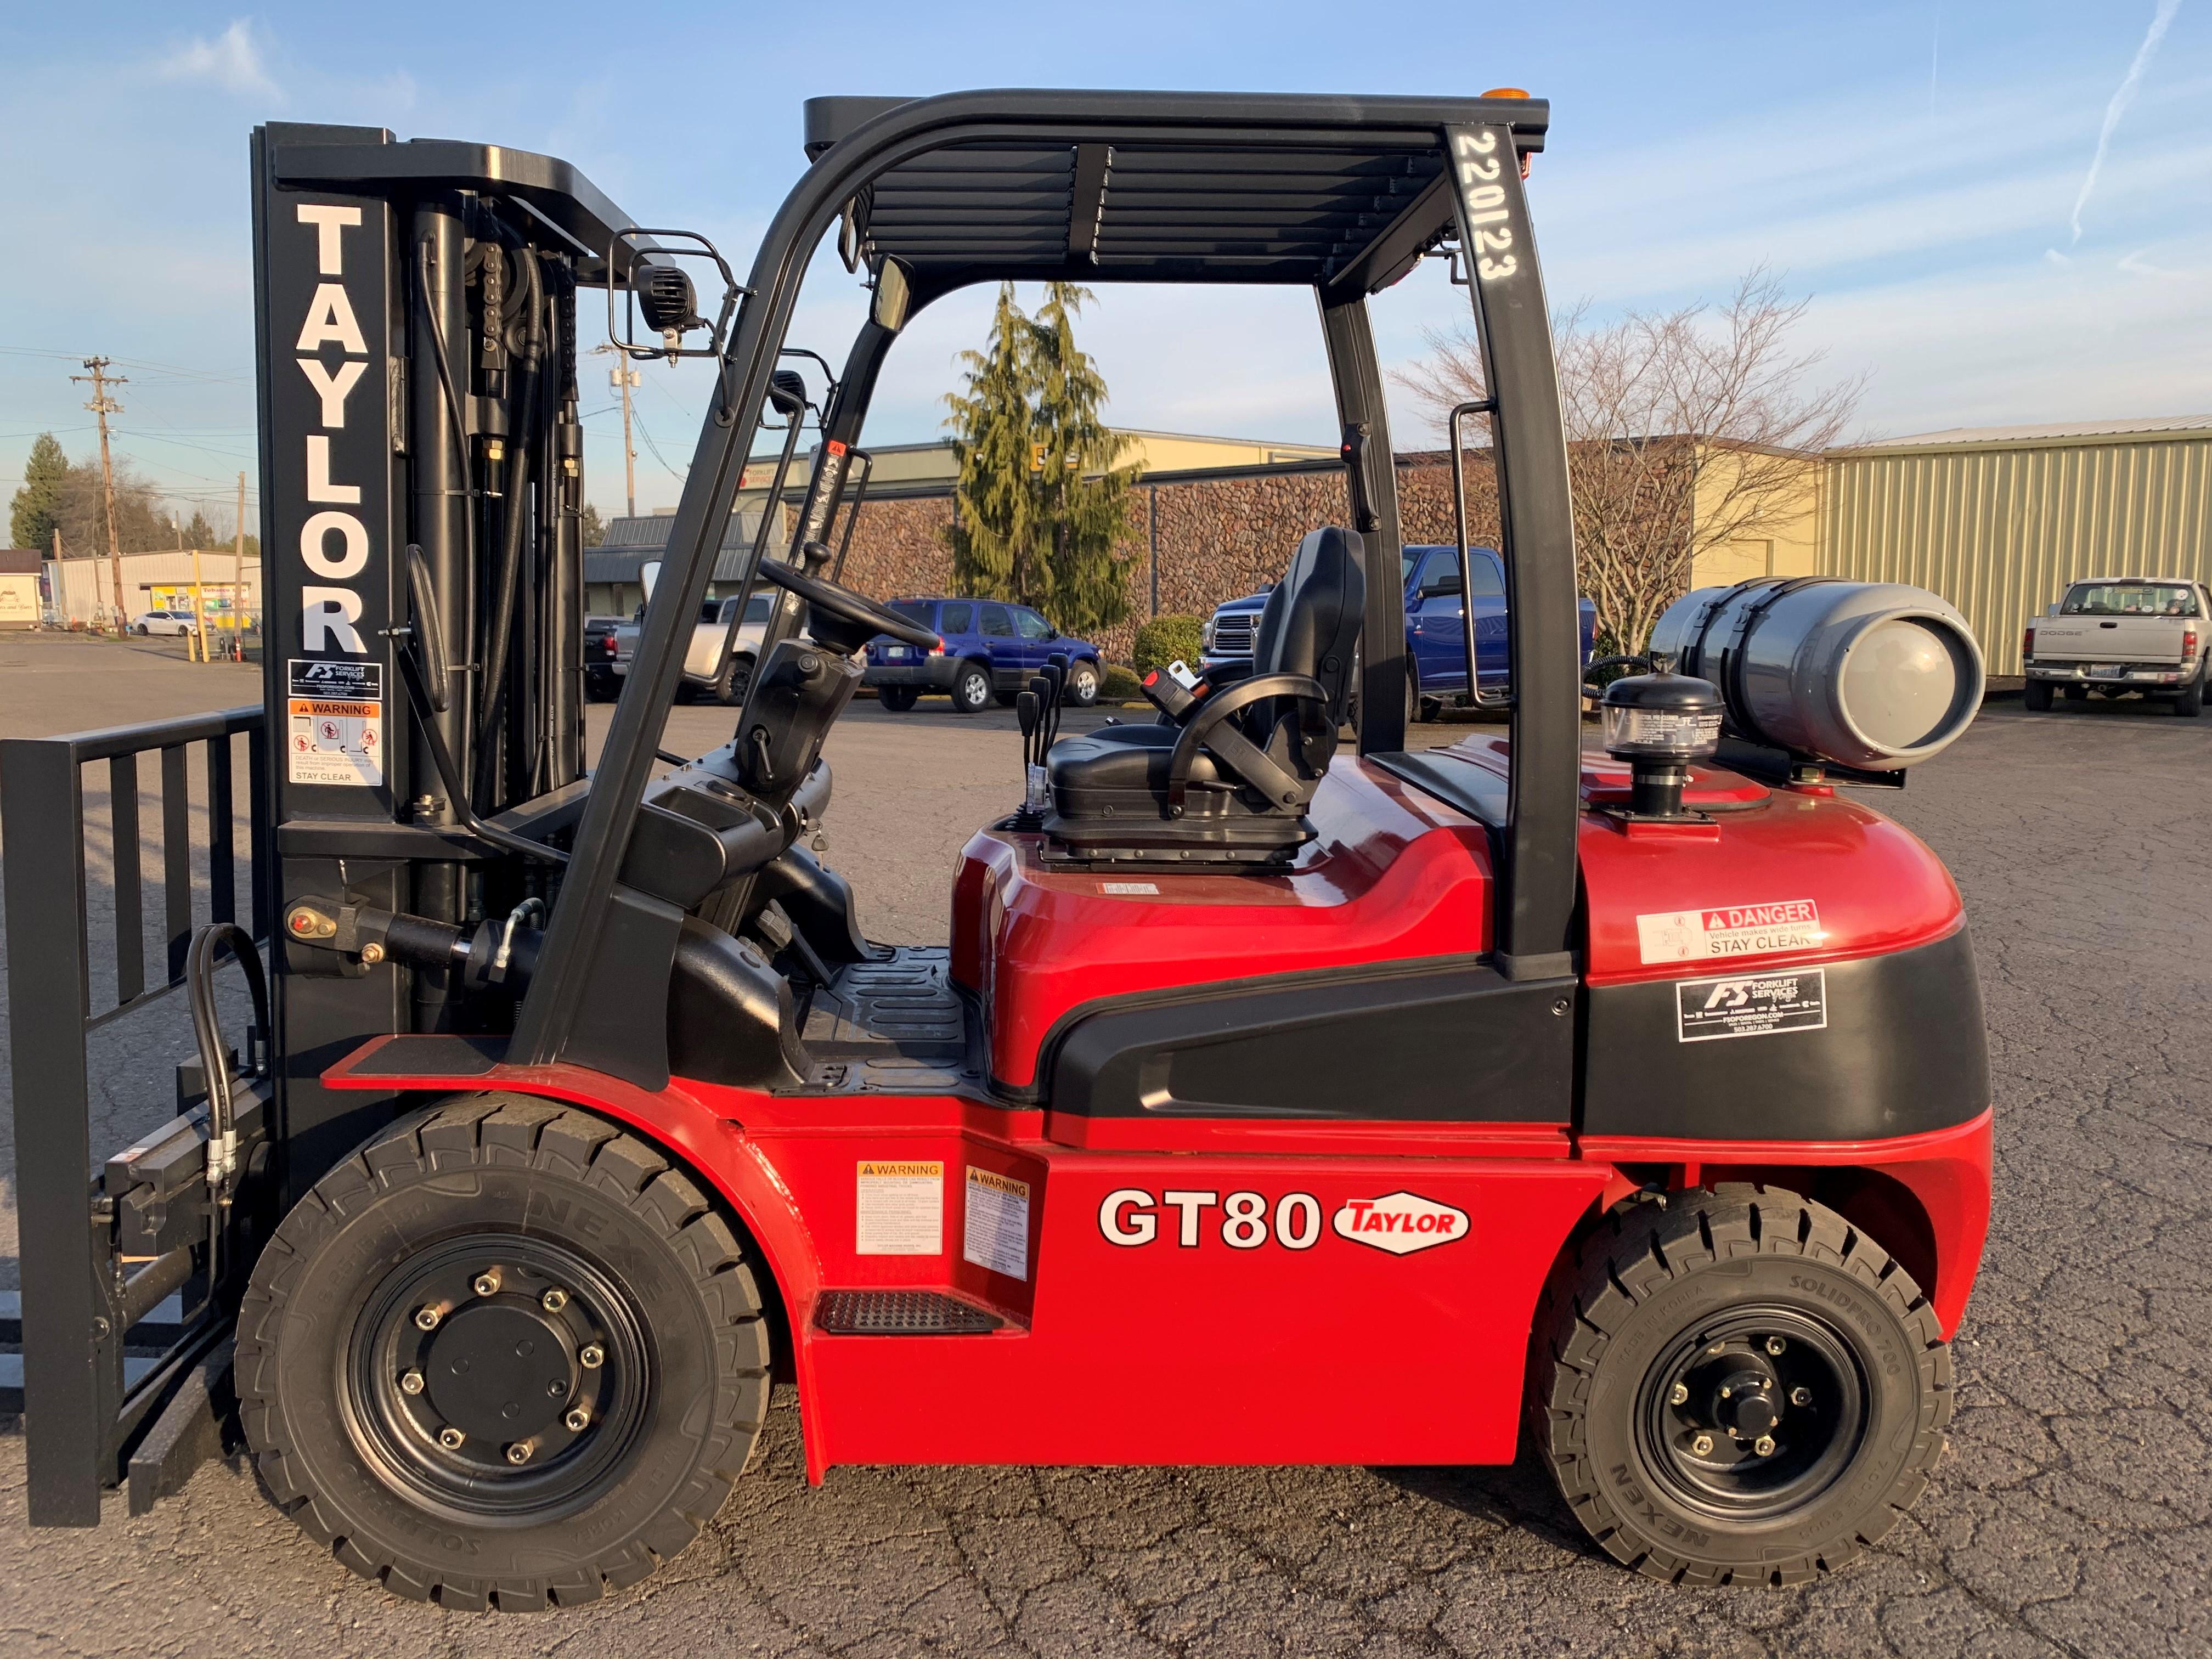 New, 2020, Taylor, GT80  (4 valve), Forklifts / Lift Trucks